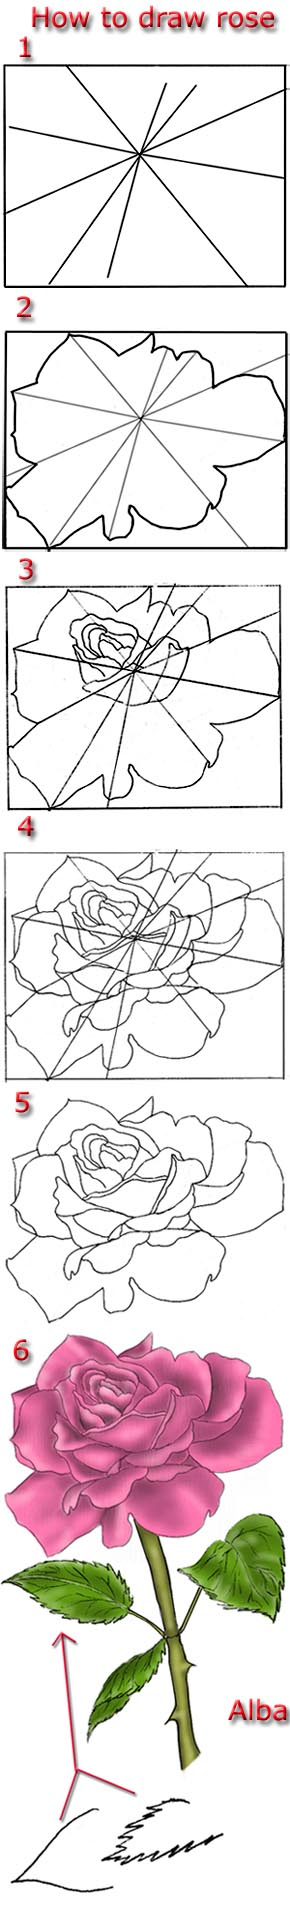 290x1905 Tutorial Draw Pink Rose Art Pink Roses, Tutorials